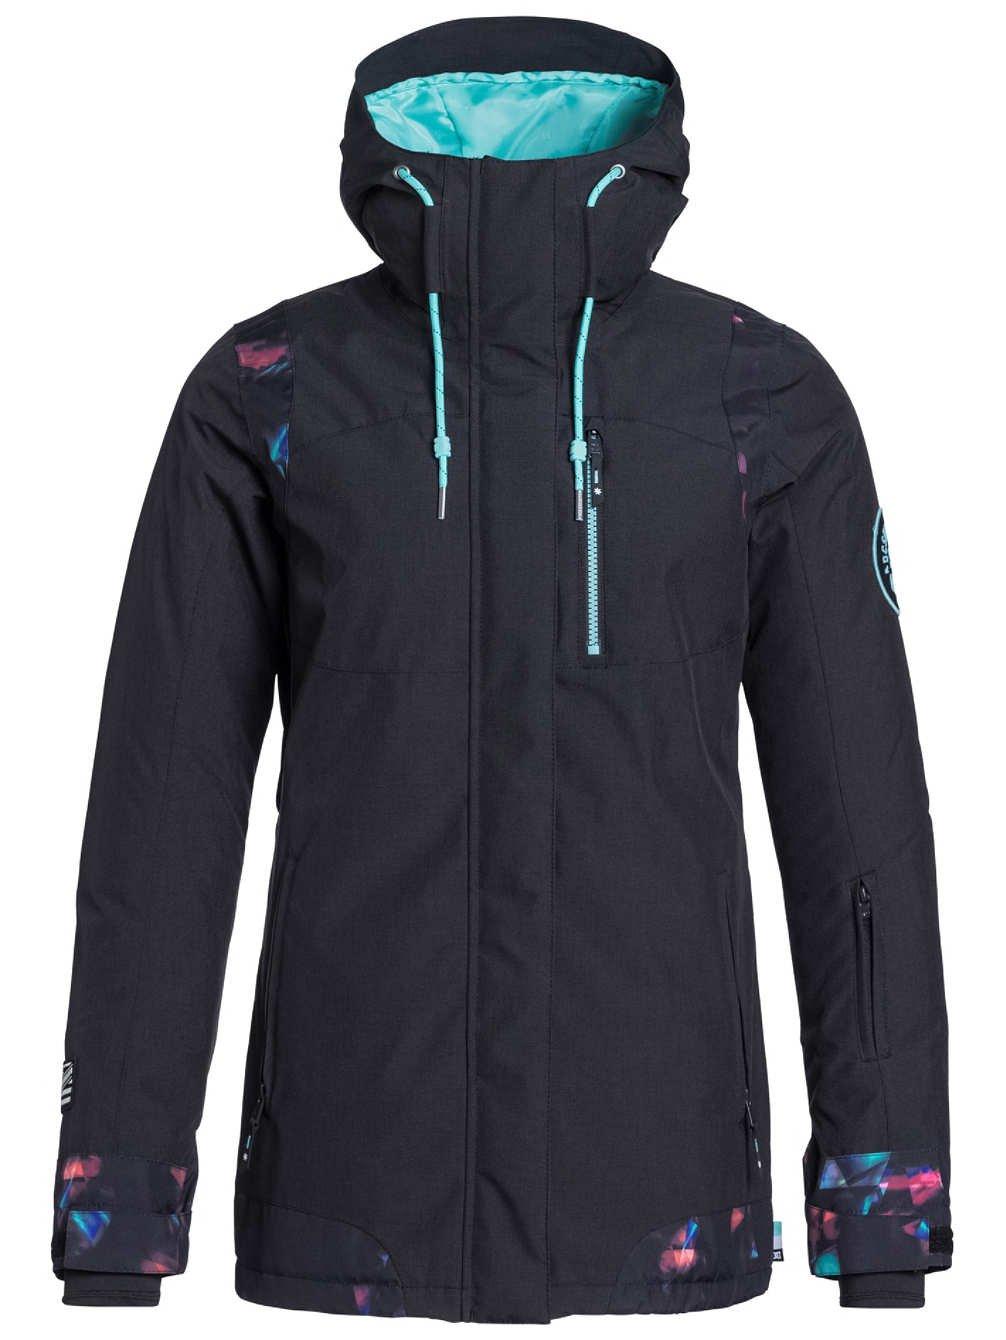 Damen Snowboard Jacke DC Truce Jacket jetzt kaufen